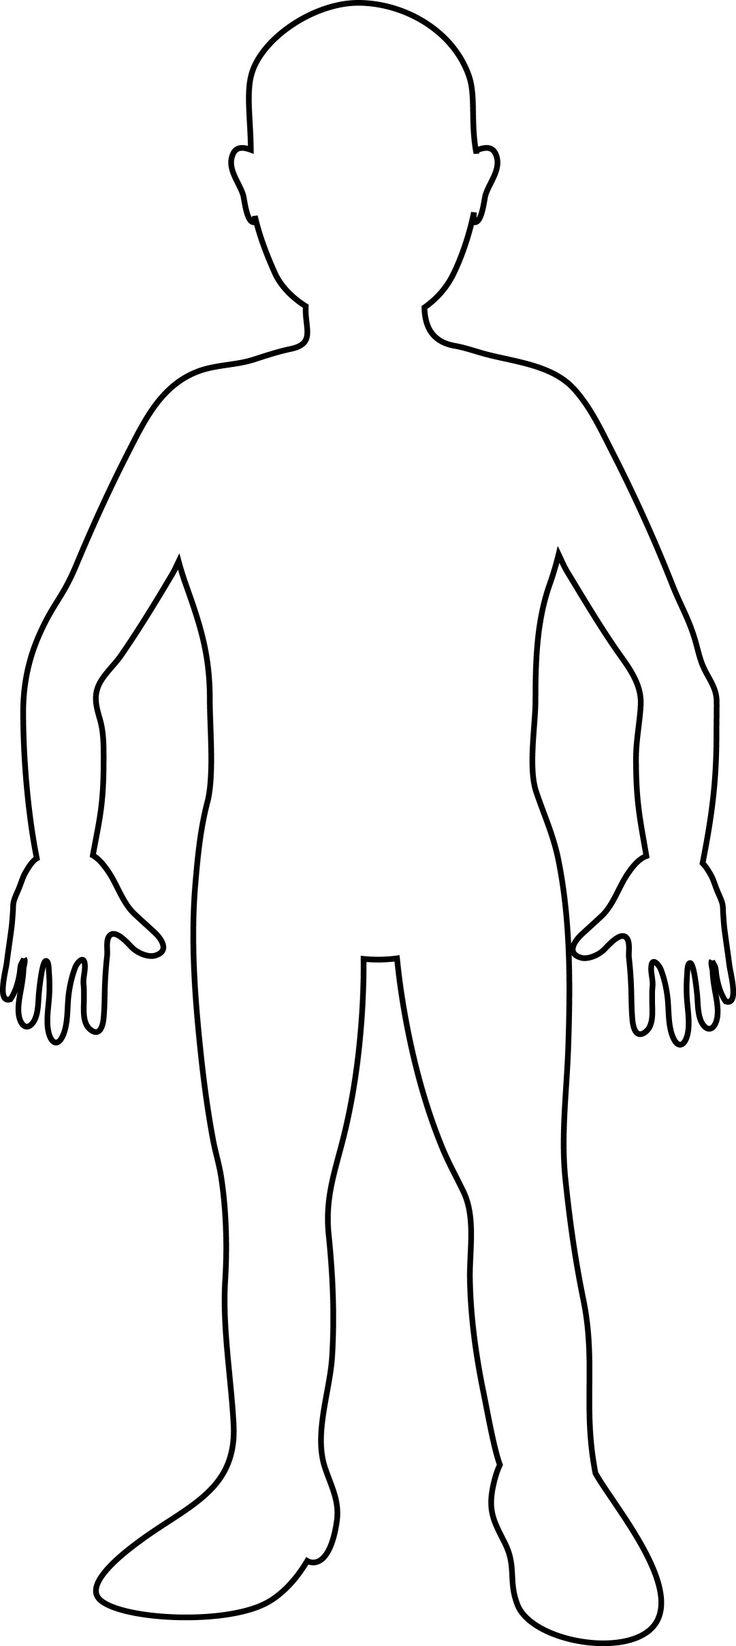 Human Body Outl...